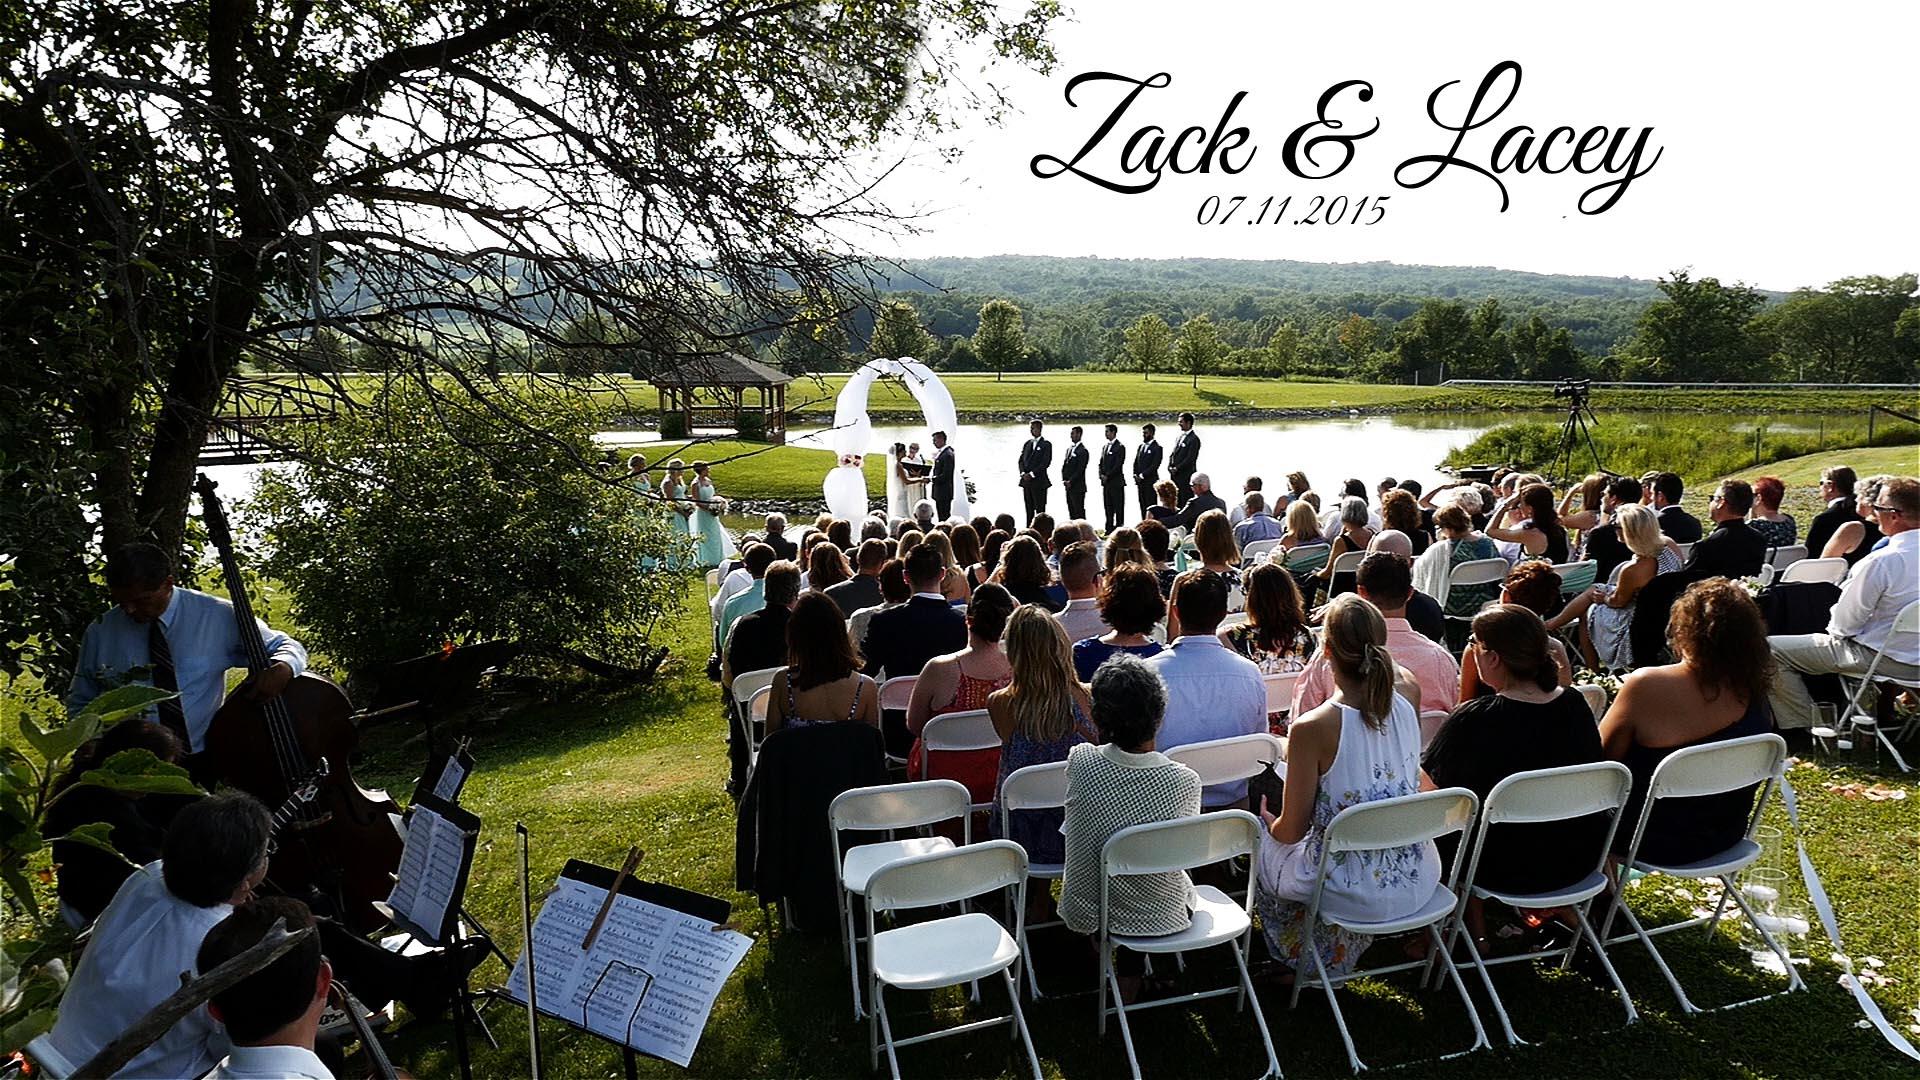 Zack & Lacey – Varysburg Wedding Video